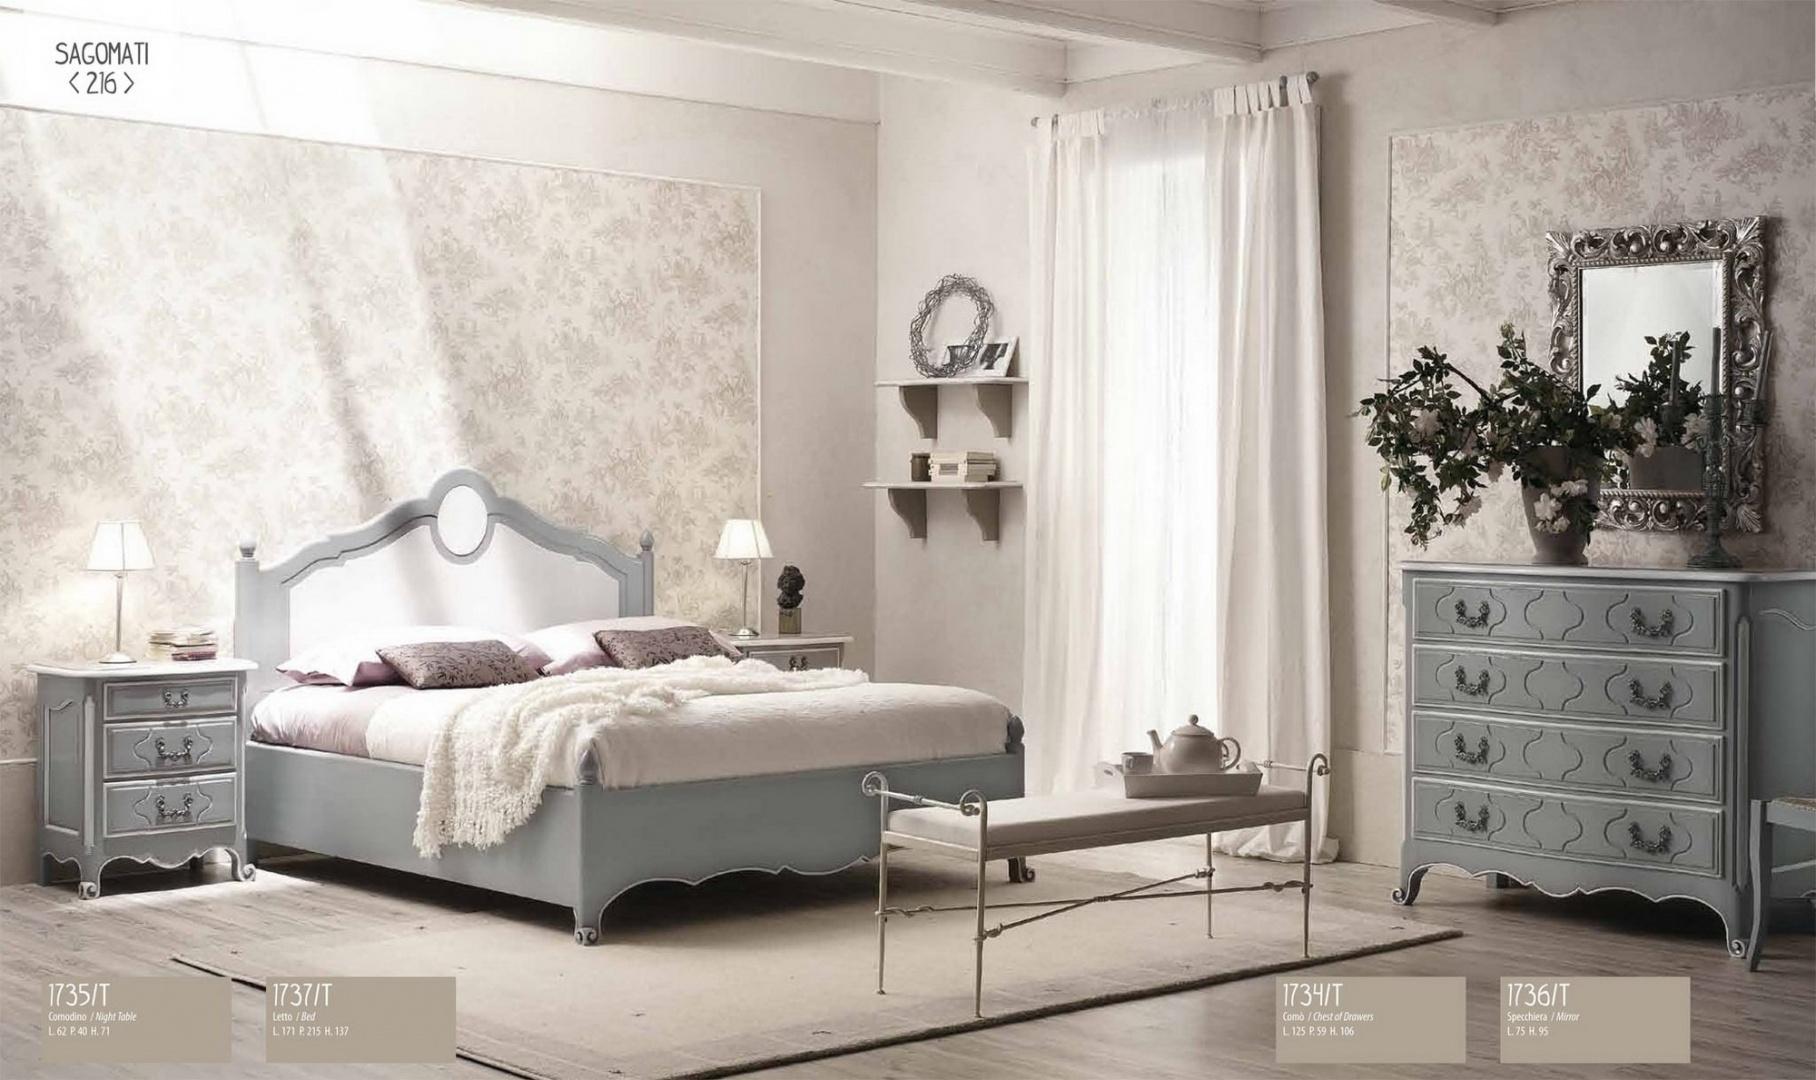 Sagomati спальный гарнитур IM536